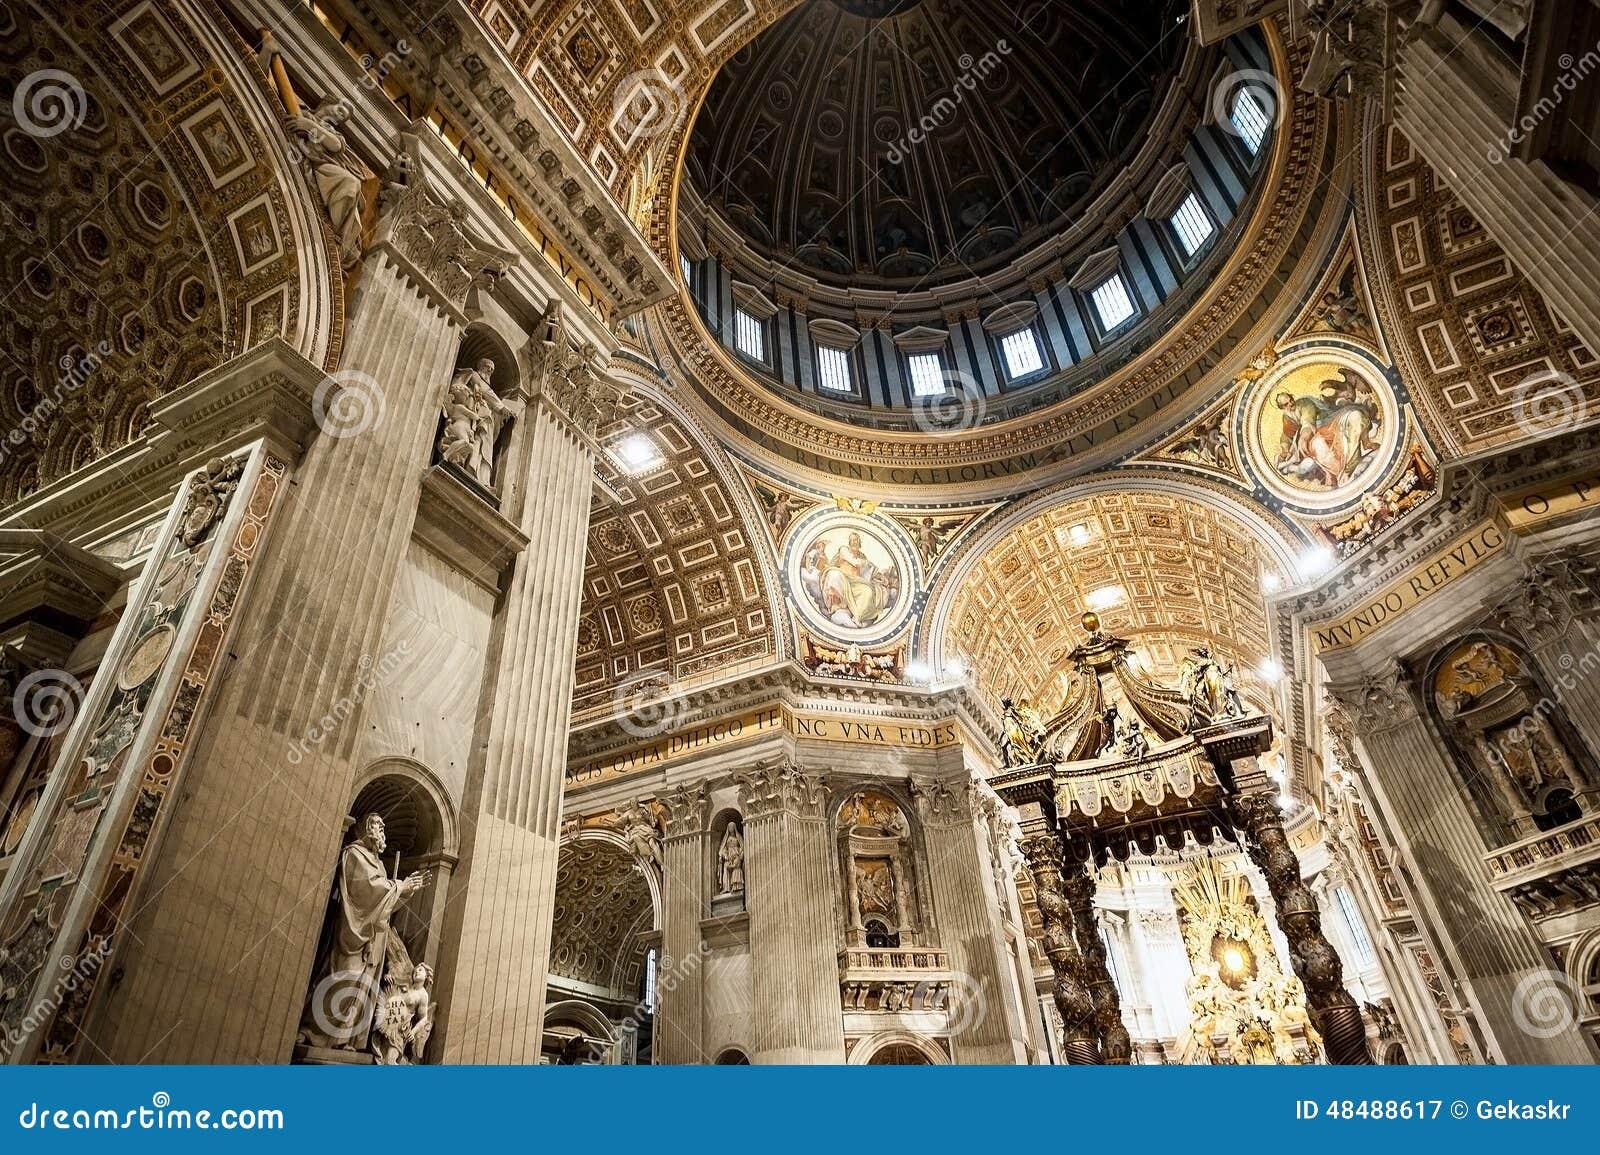 https://thumbs.dreamstime.com/z/st-peter-s-basilica-vatican-inside-interior-48488617.jpg